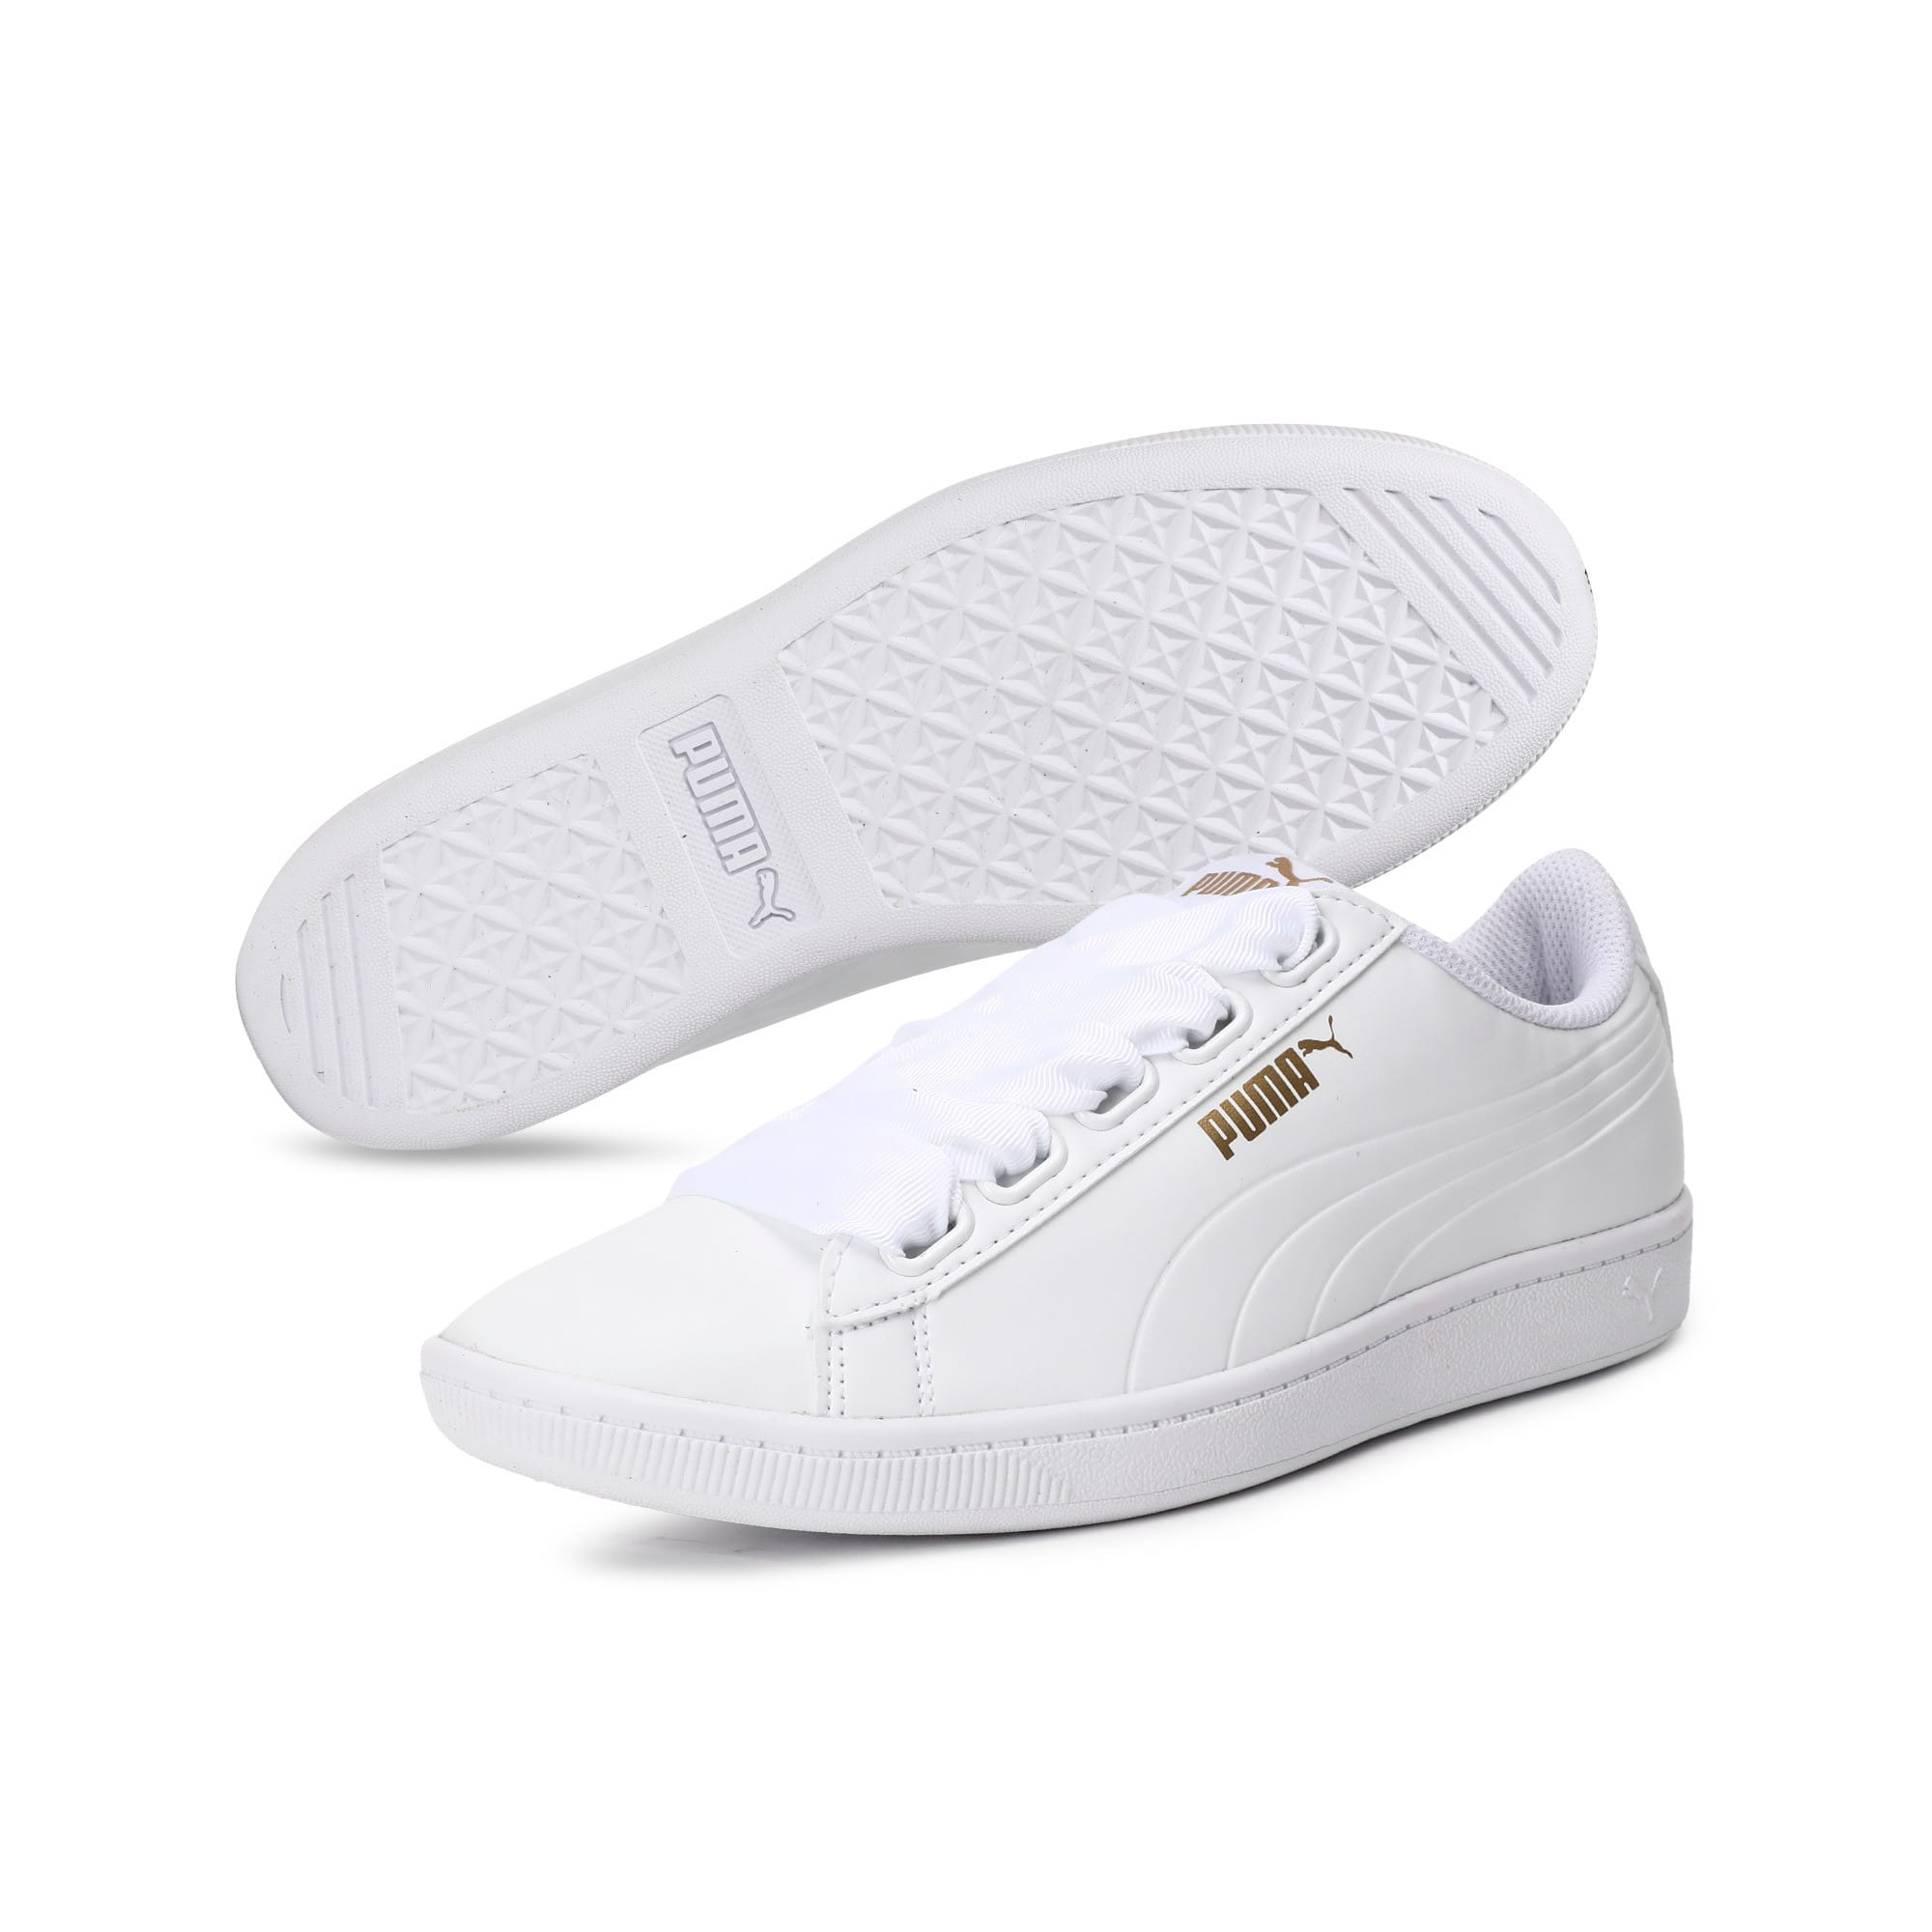 Thumbnail 6 of Women's Puma Vikky Ribbon Sneakers, Puma White-Puma White, medium-IND